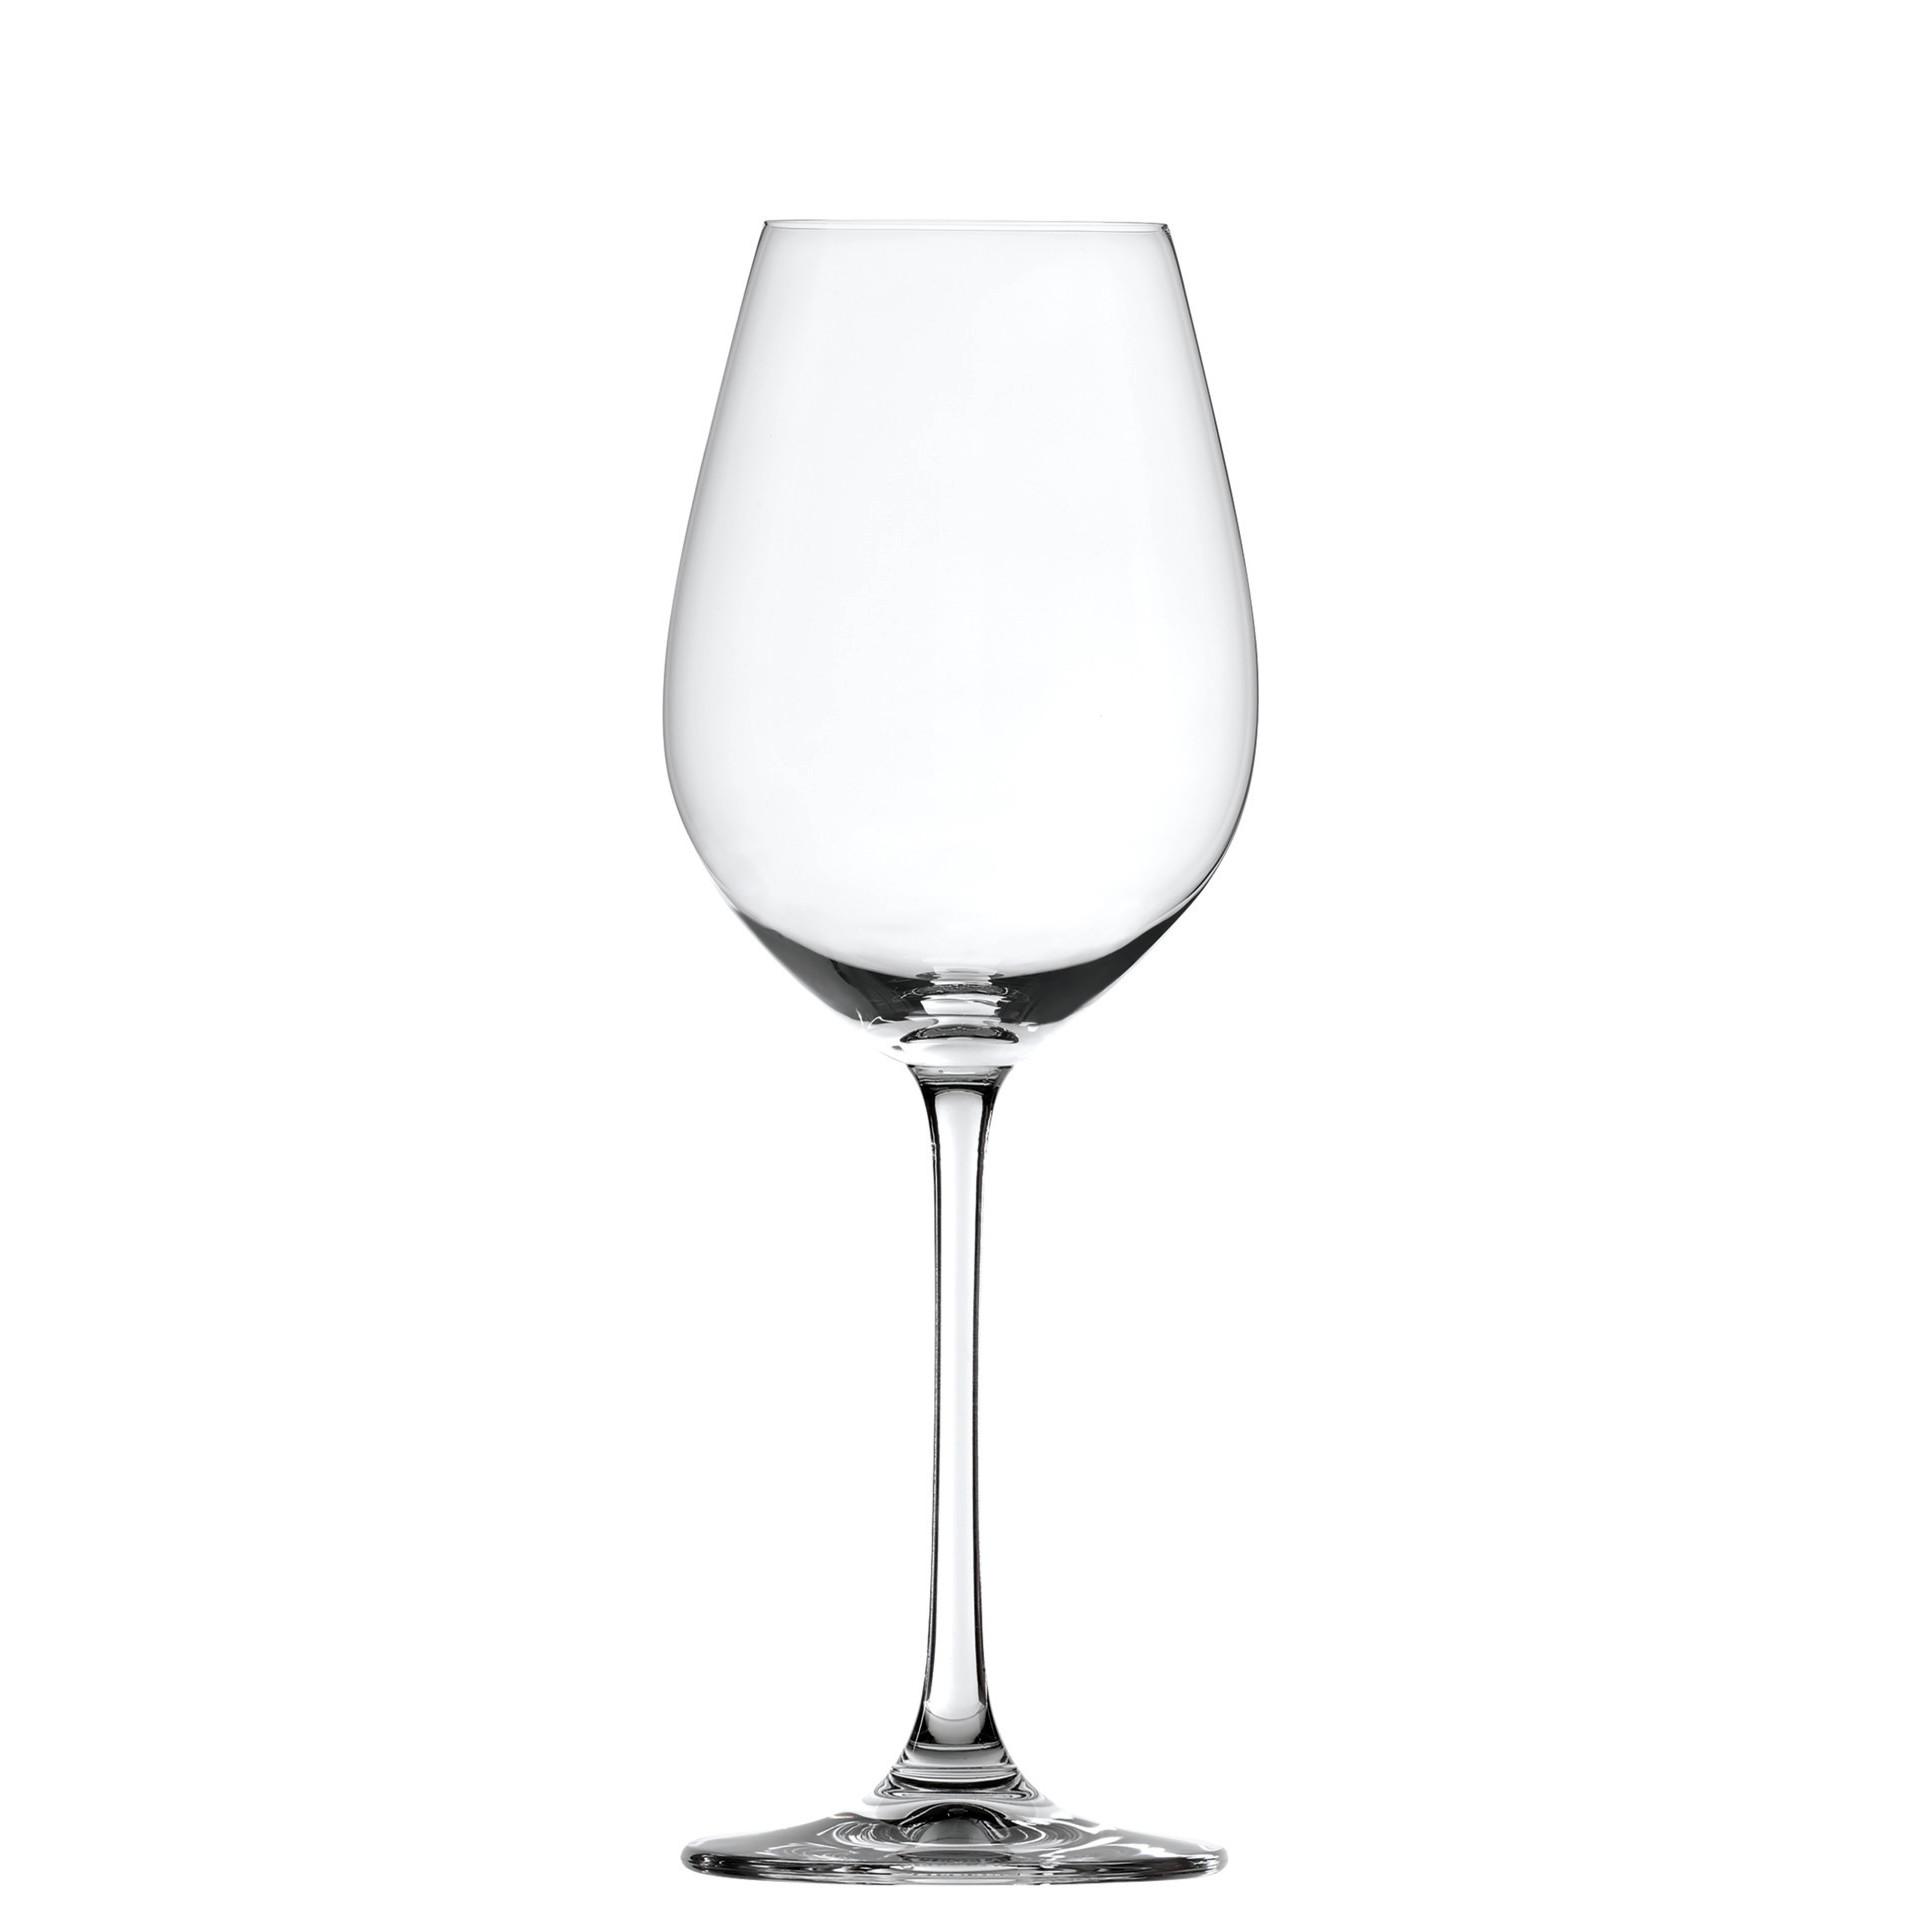 Salute, Weißweinglas ø 87 mm / 0,47 l 0,10 + 0,20 /-/